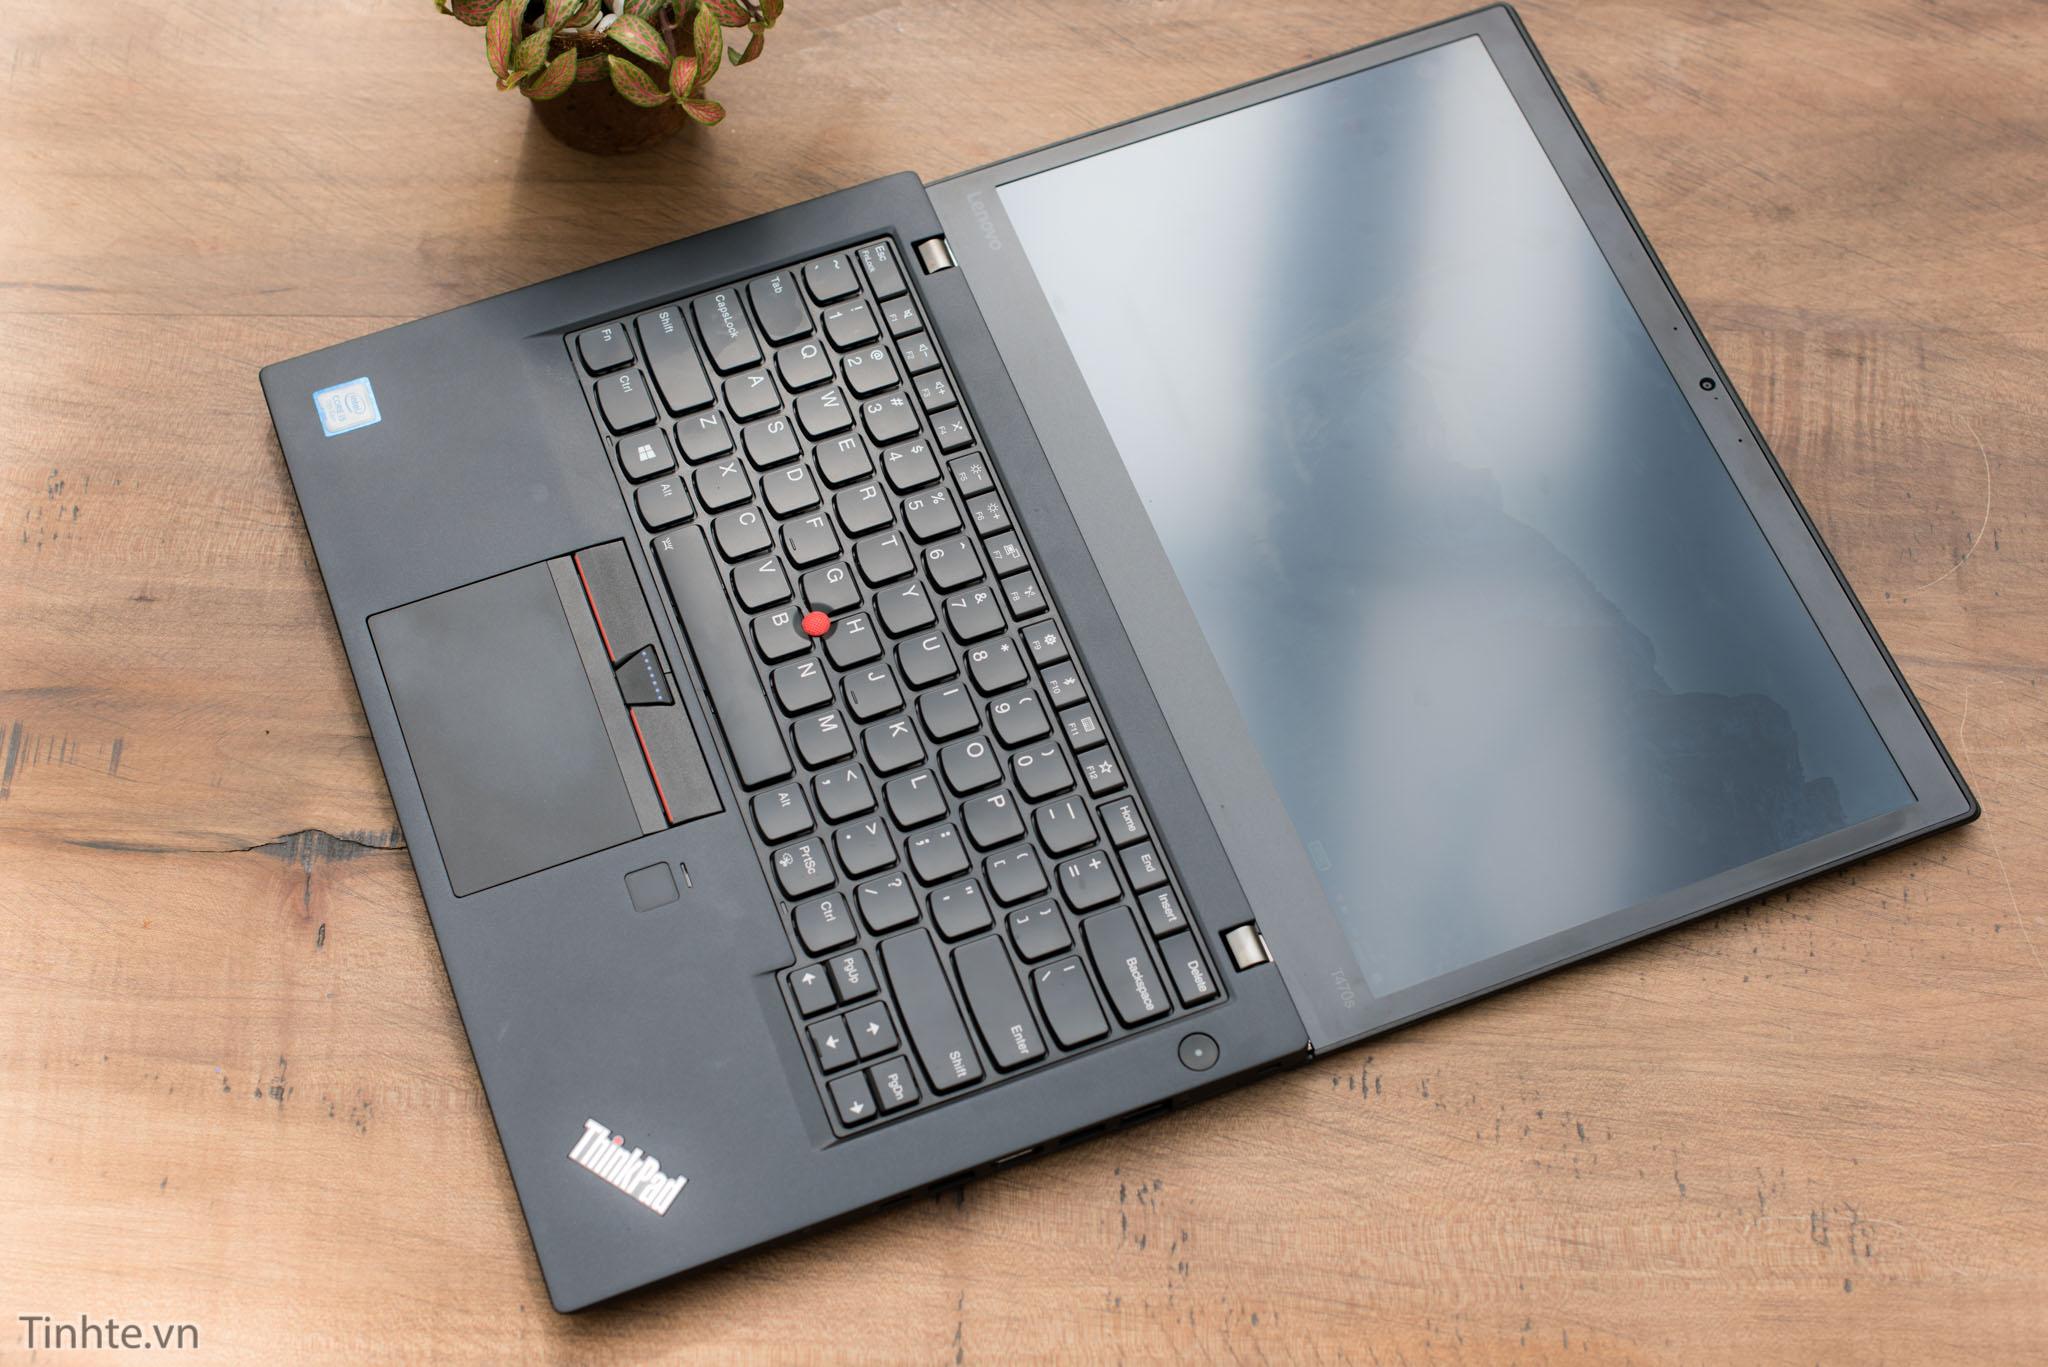 Tinhte.vn_ThinkPad_T470s-4.jpg